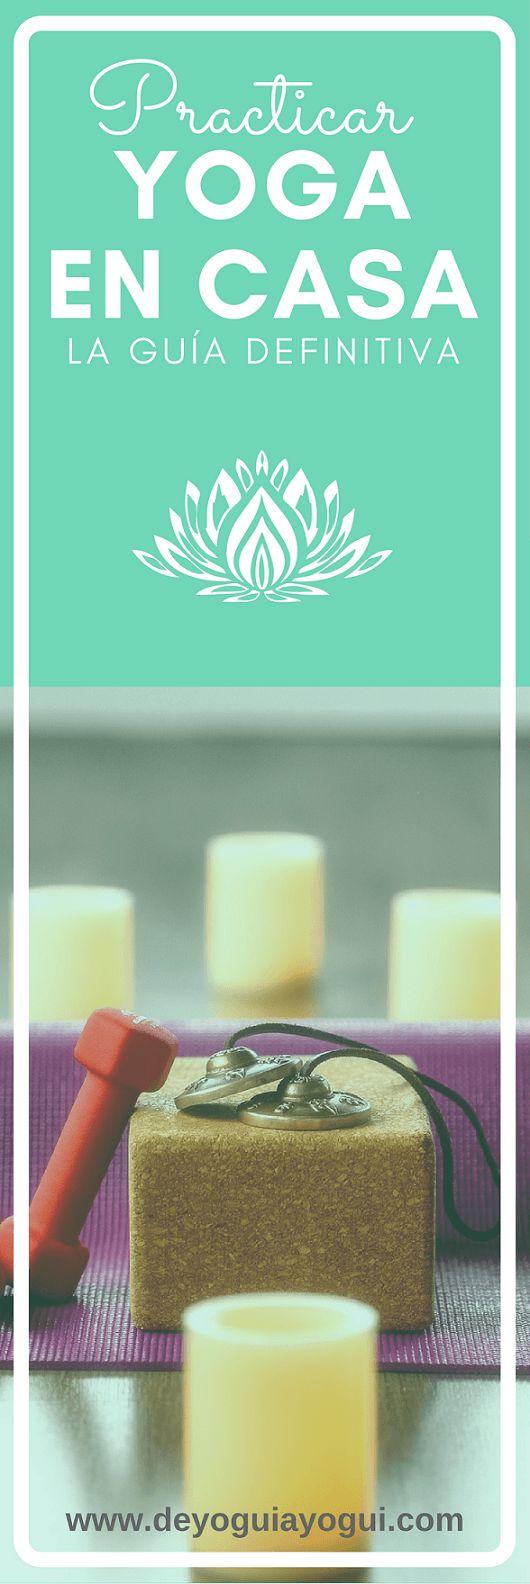 M s de 25 ideas incre bles sobre yoga en casa en pinterest - Musica para hacer yoga en casa ...